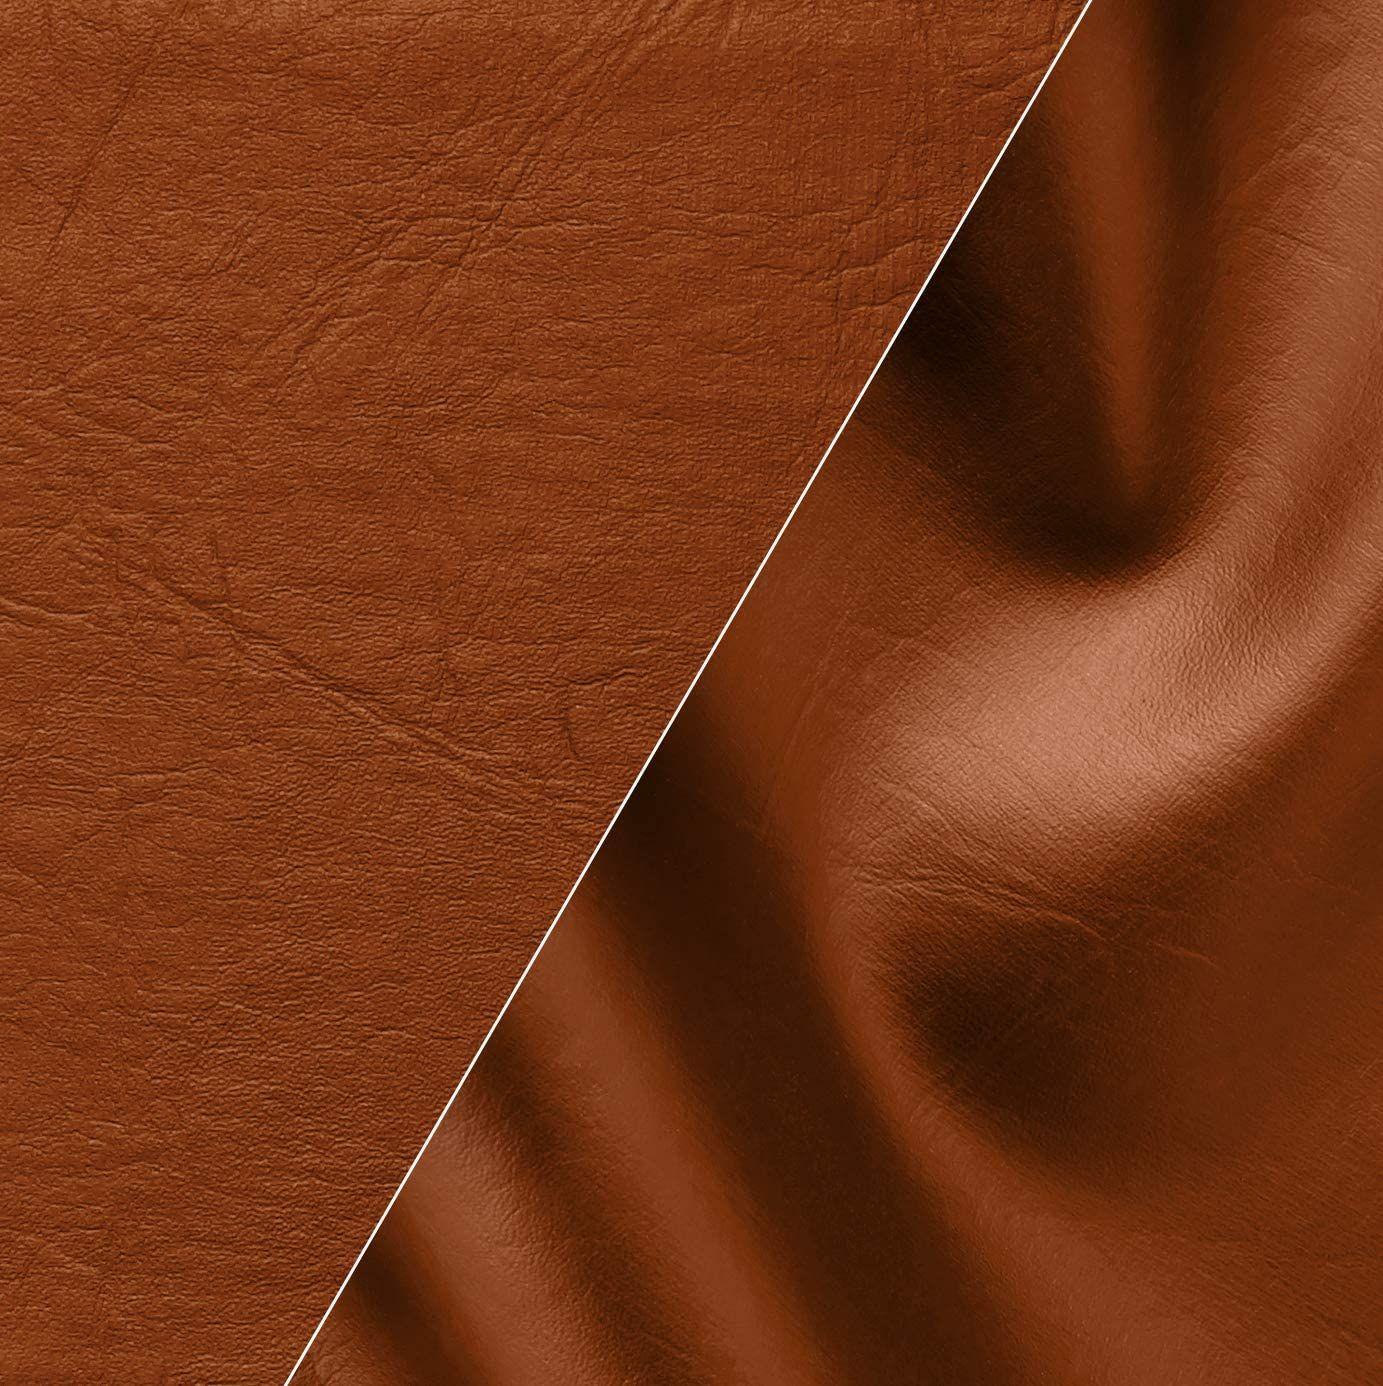 Vvivid Light Brown Weatherproof Faux Leather Finish Marine Vinyl Fabric 1 5ft X 54 In 2020 Marine Vinyl Fabric Vinyl Fabric Leather Craft